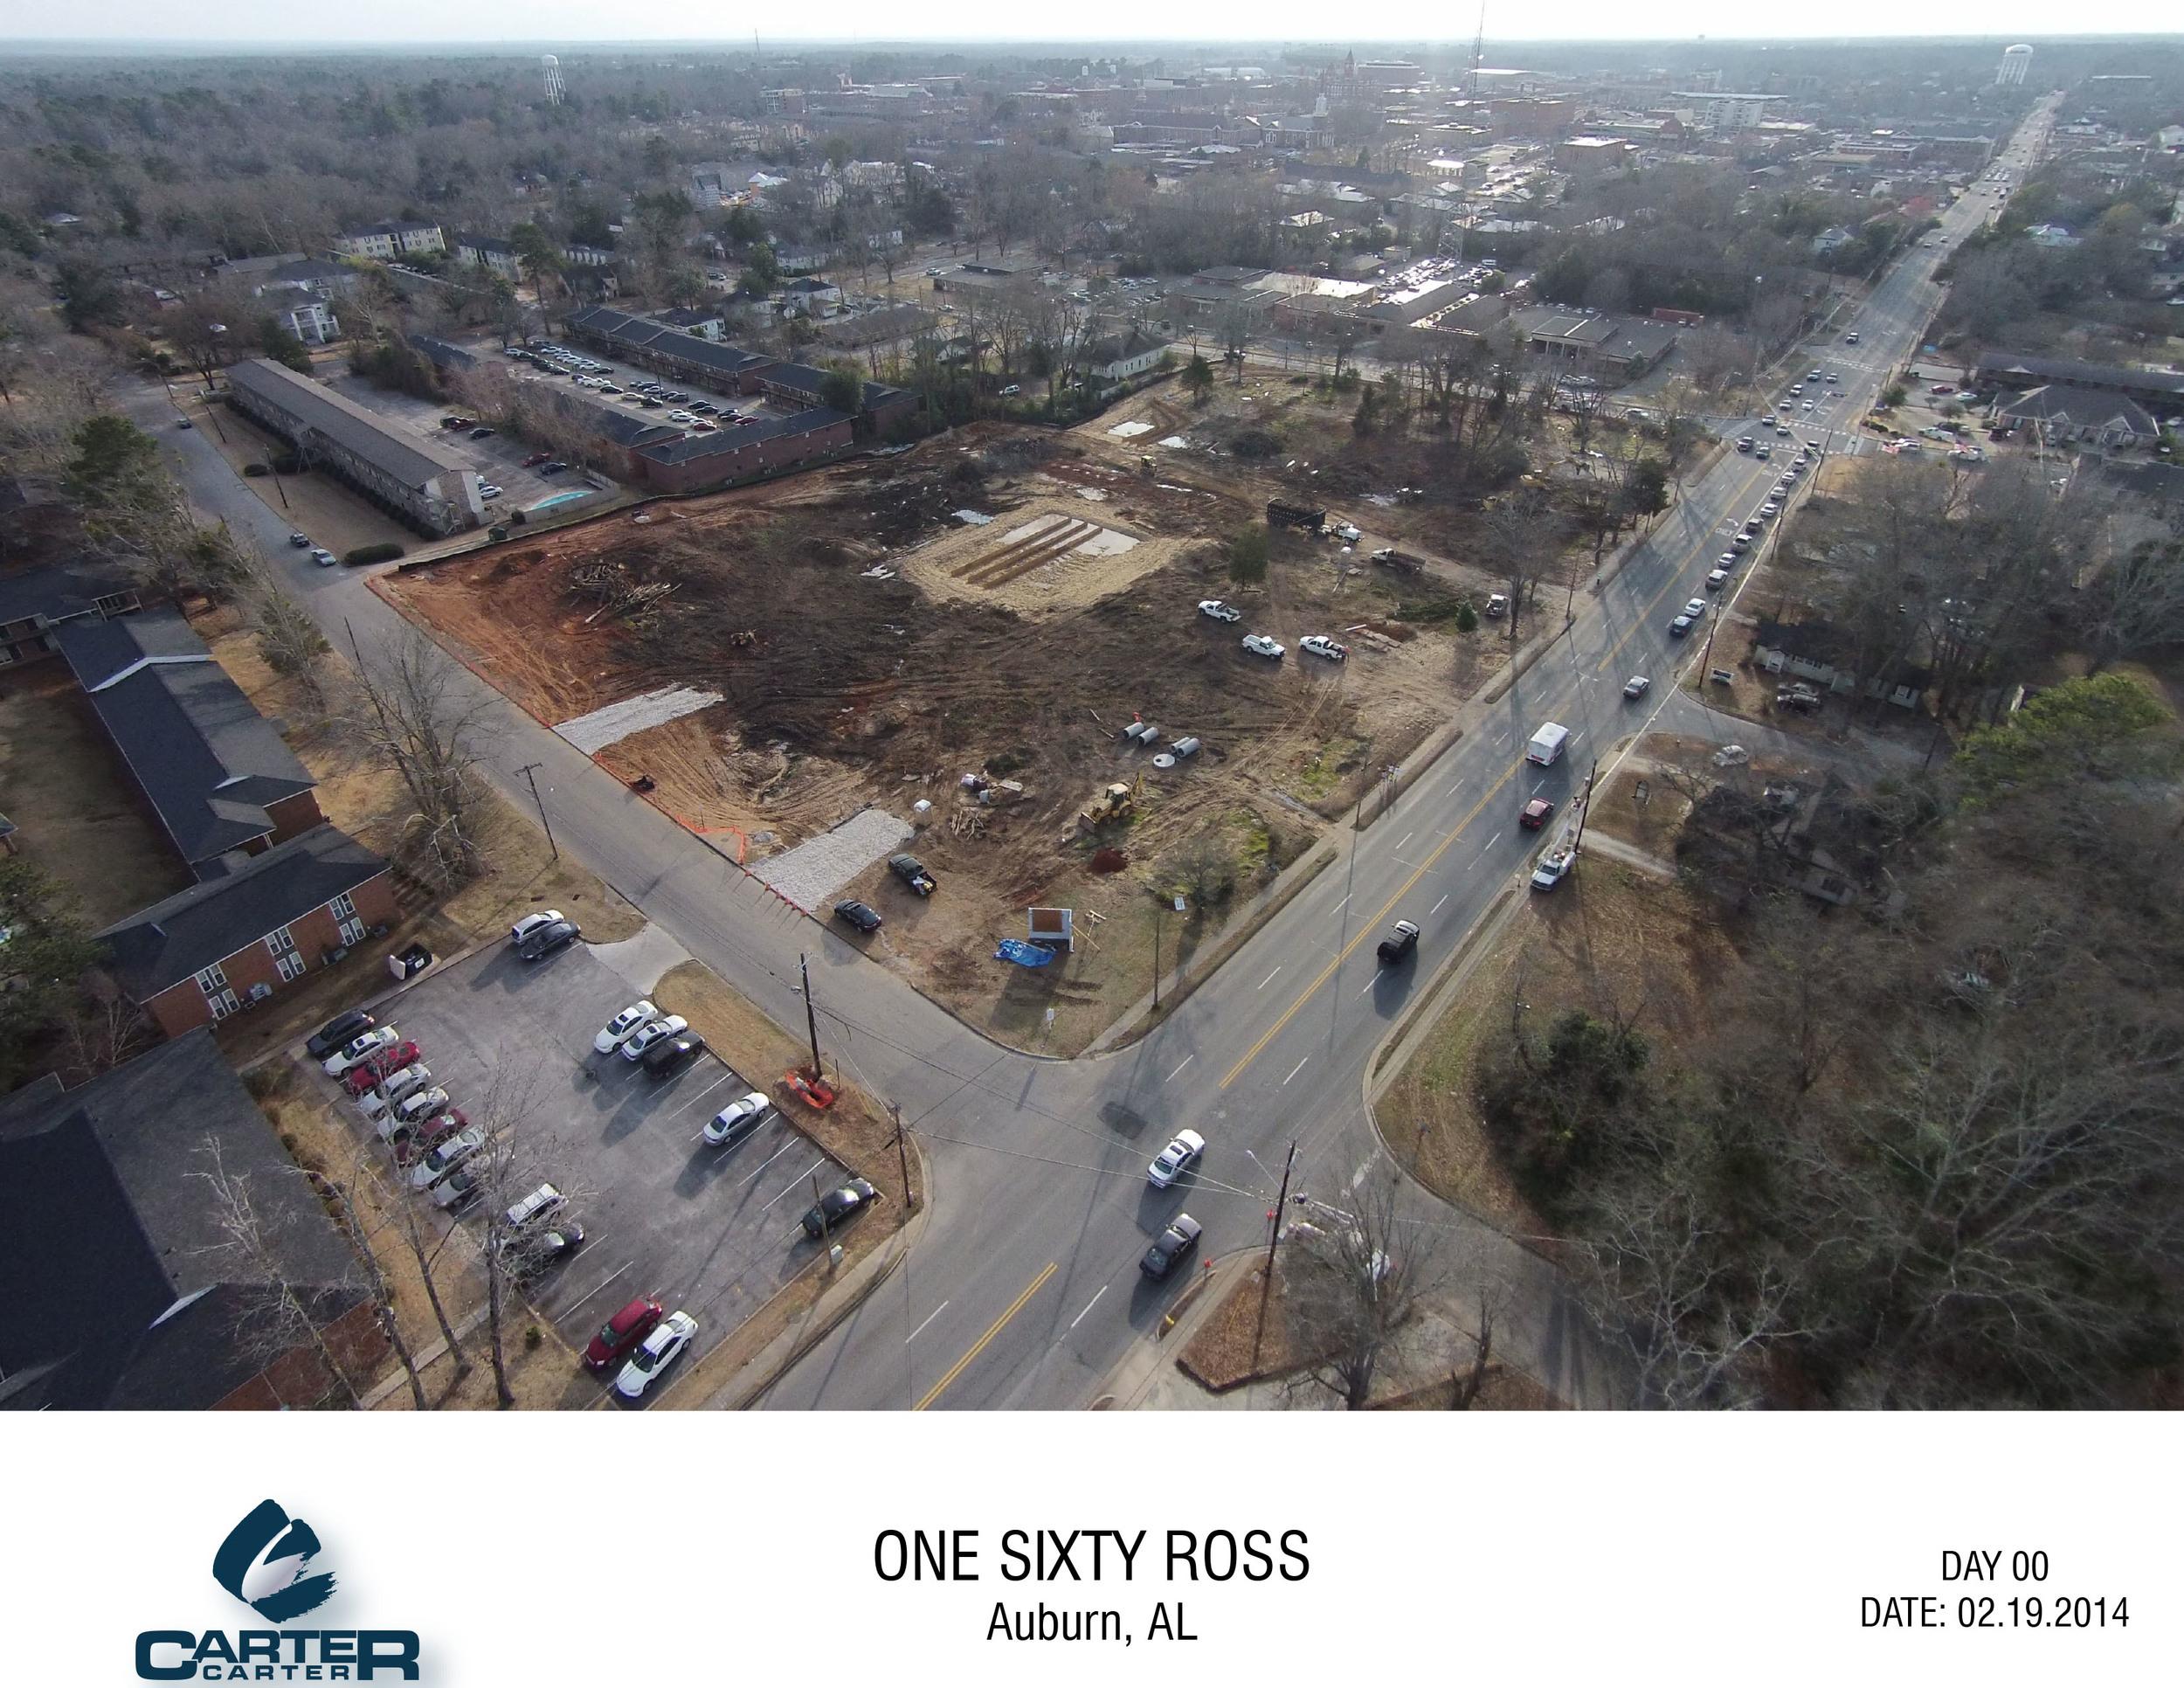 One Sixty Ross 140219-1.jpg